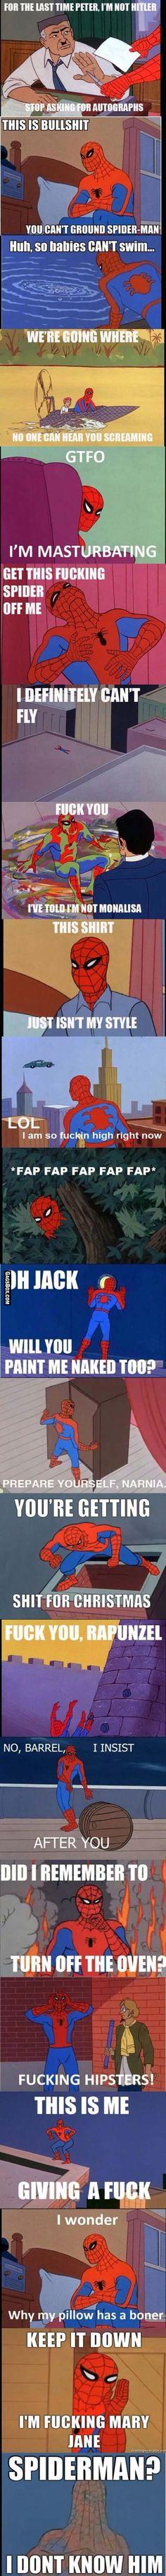 Ooohhh Spidey...